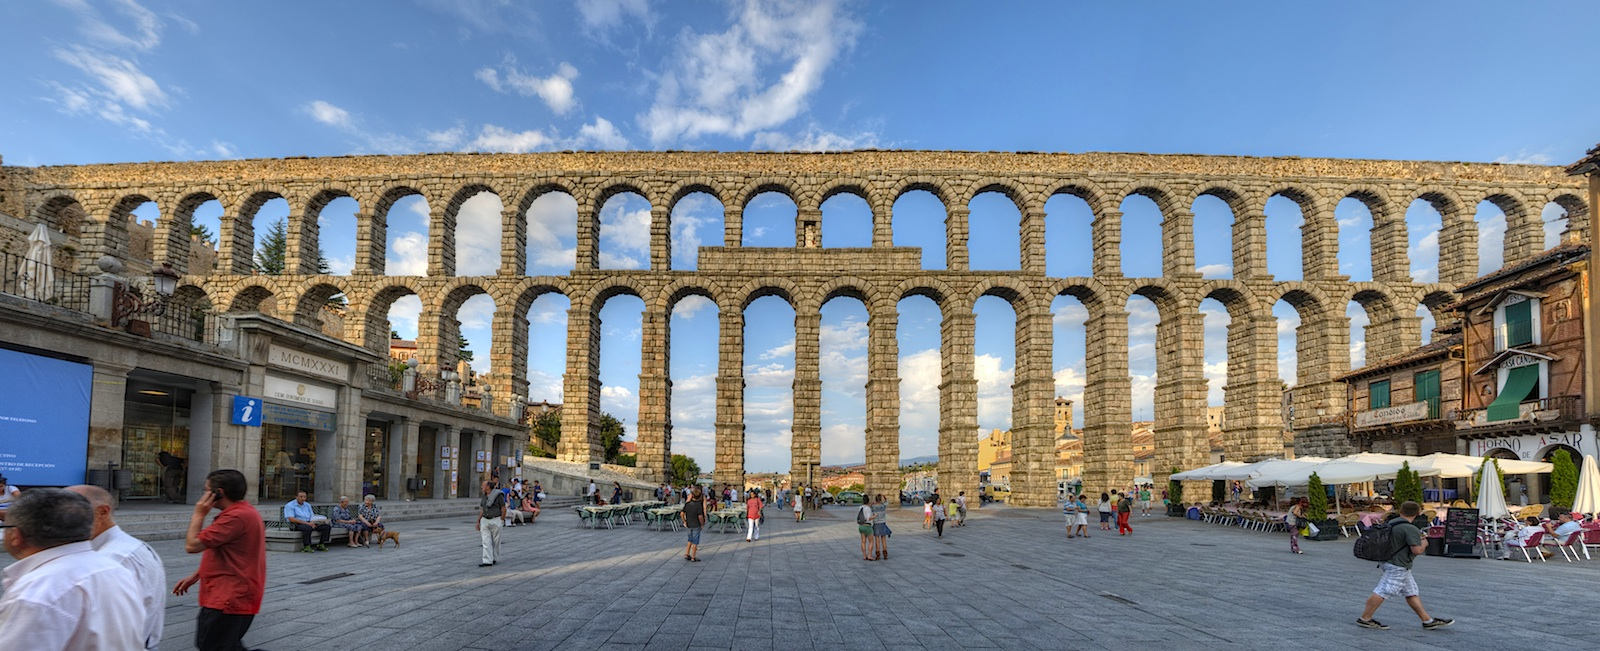 Segovia, Spain : pics